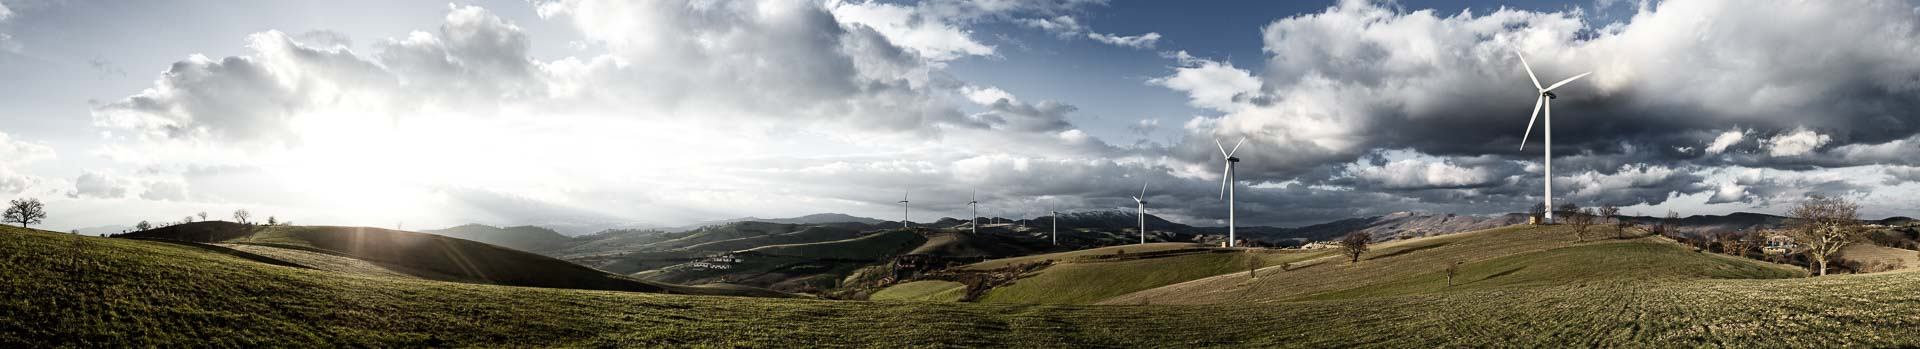 Sonnenaufgang Windräder – 360° Foto